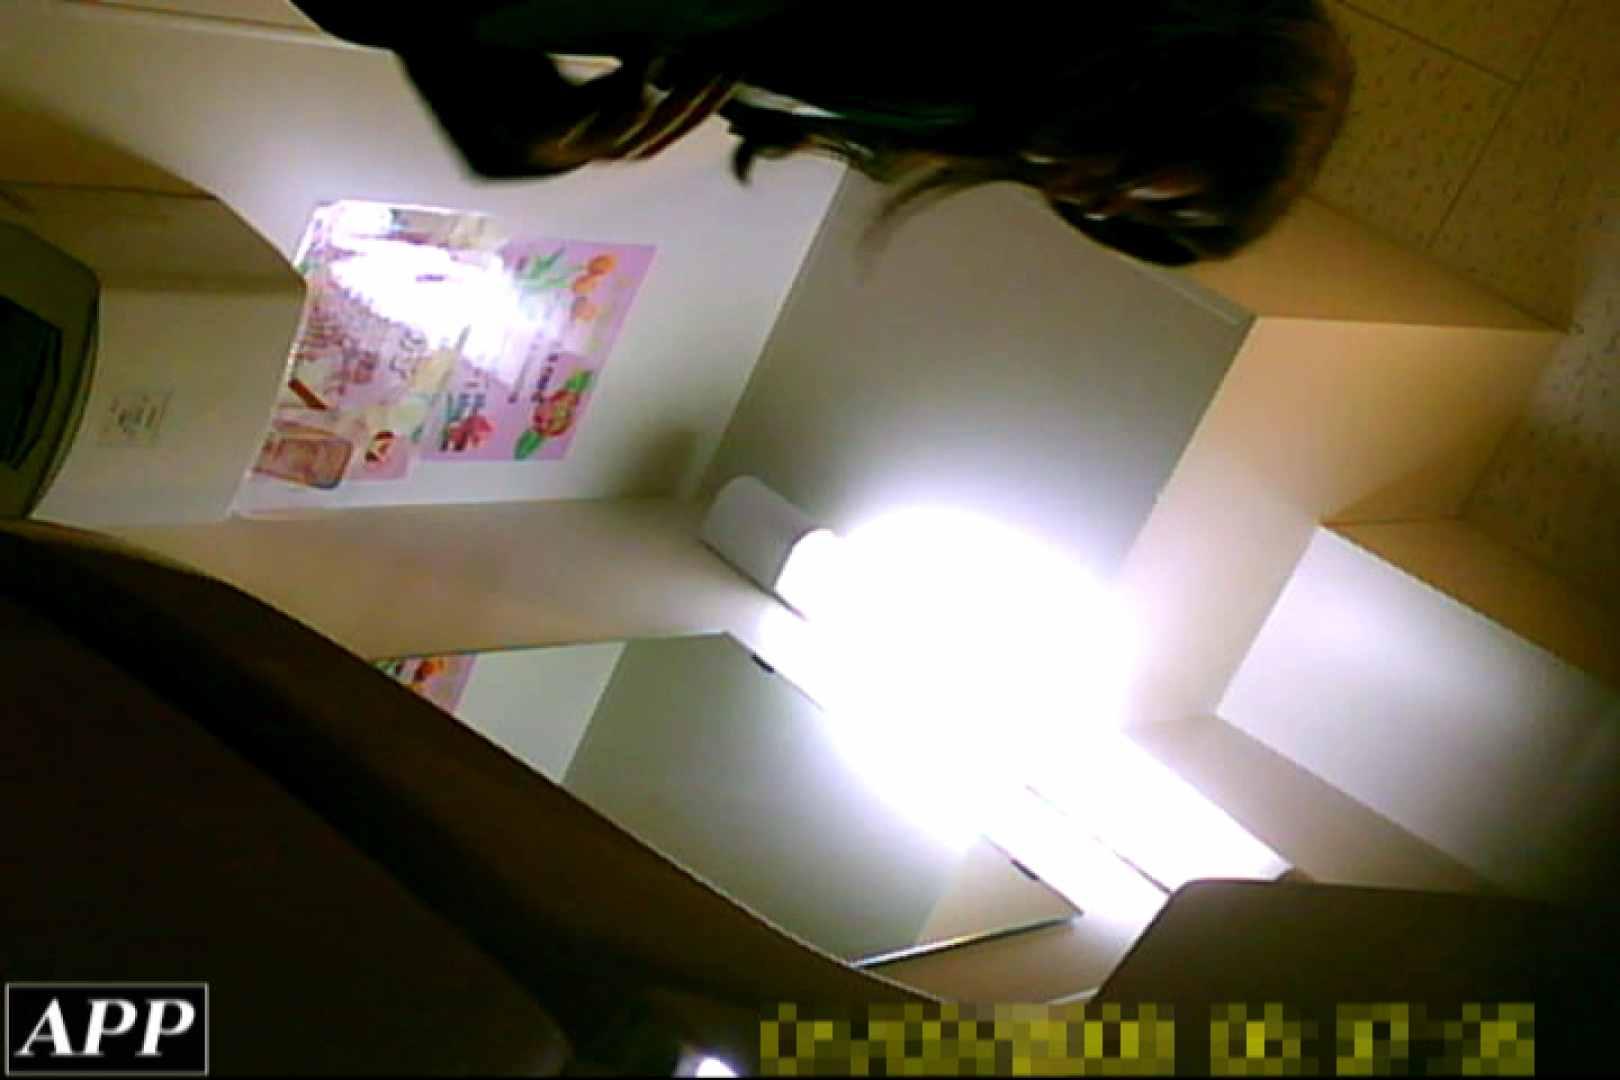 3視点洗面所 vol.121 OLハメ撮り  86Pix 12